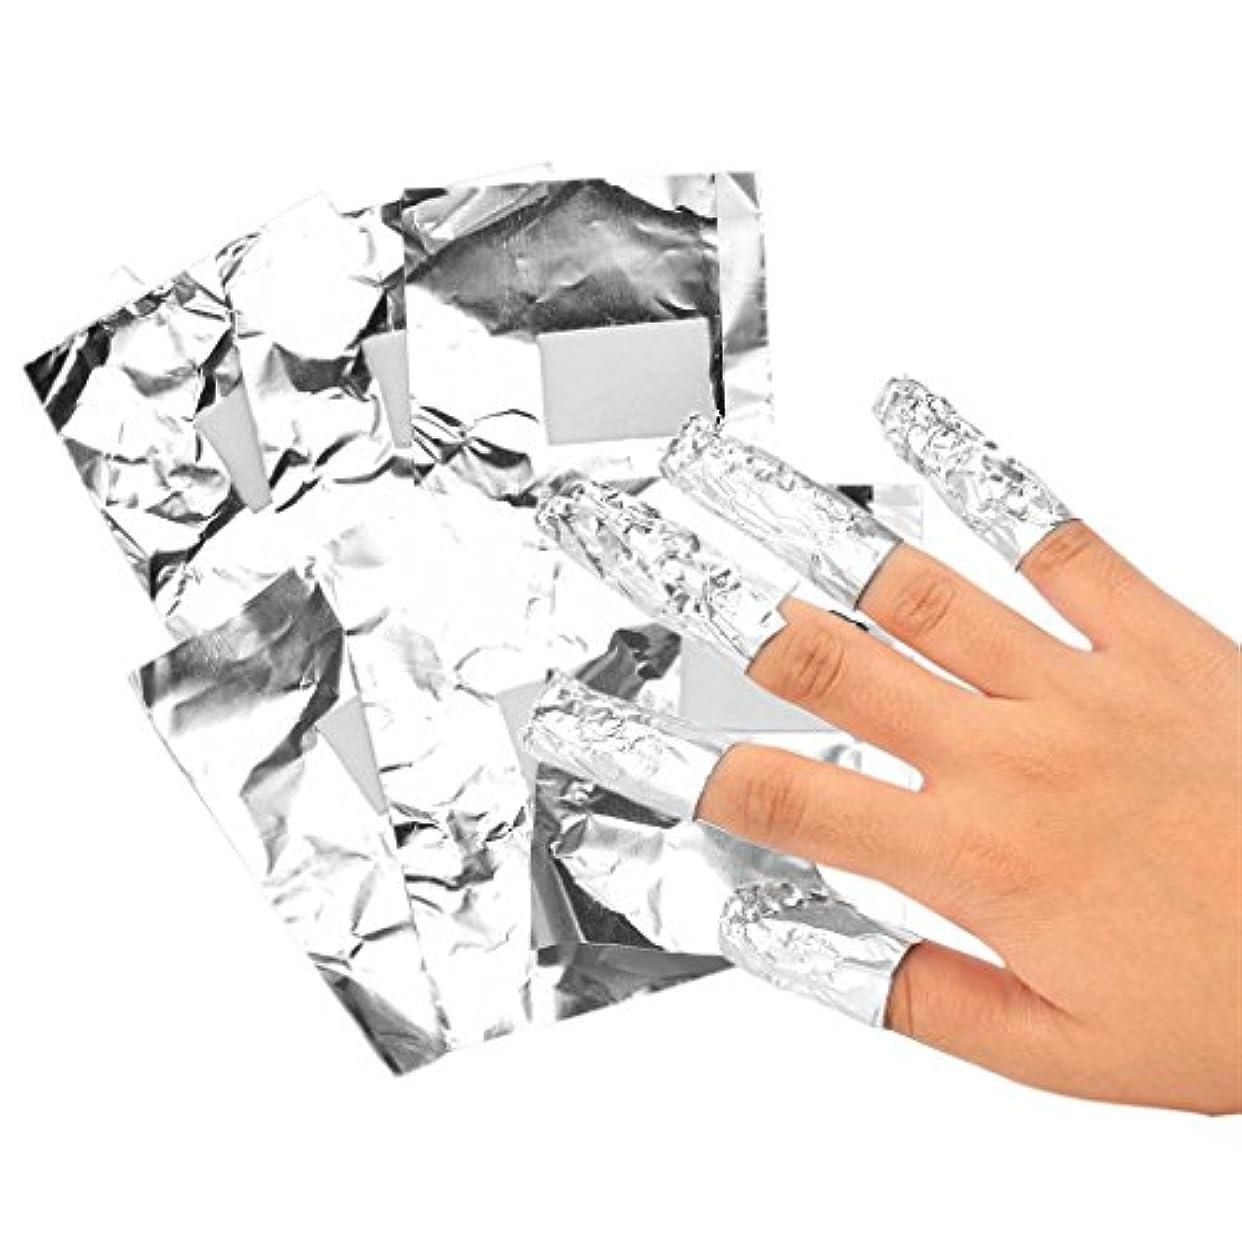 Perfeclan 約100本入り ネイルフォイル アルミ箔 ネイルアートジェル除去ツール プロ 爪装飾除き 包み紙